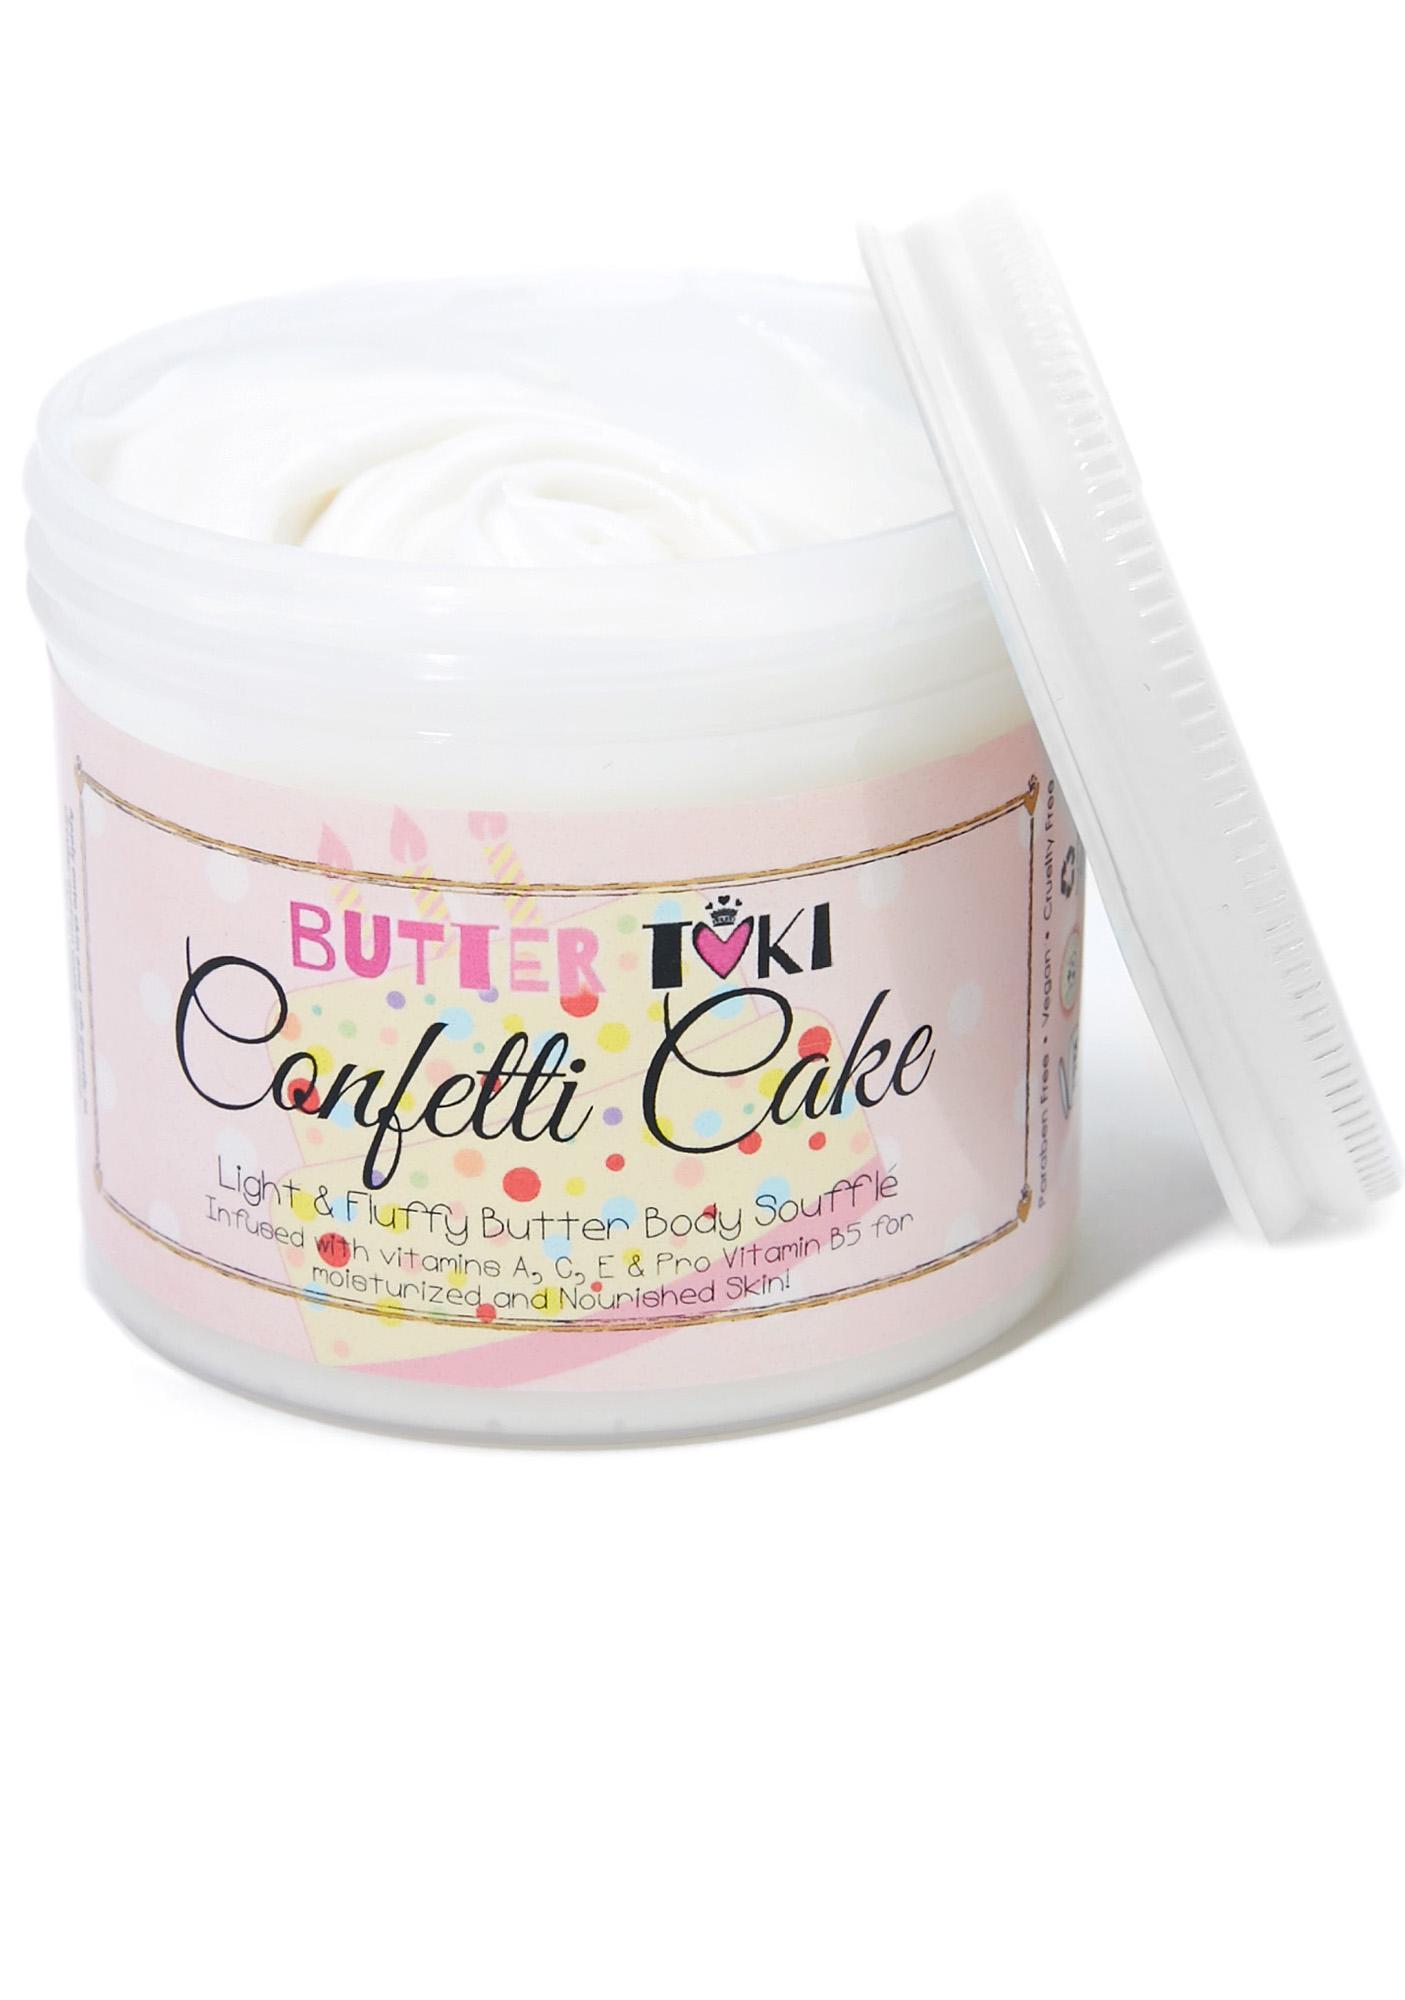 Butter Toki Confetti Cake Body Soufflé